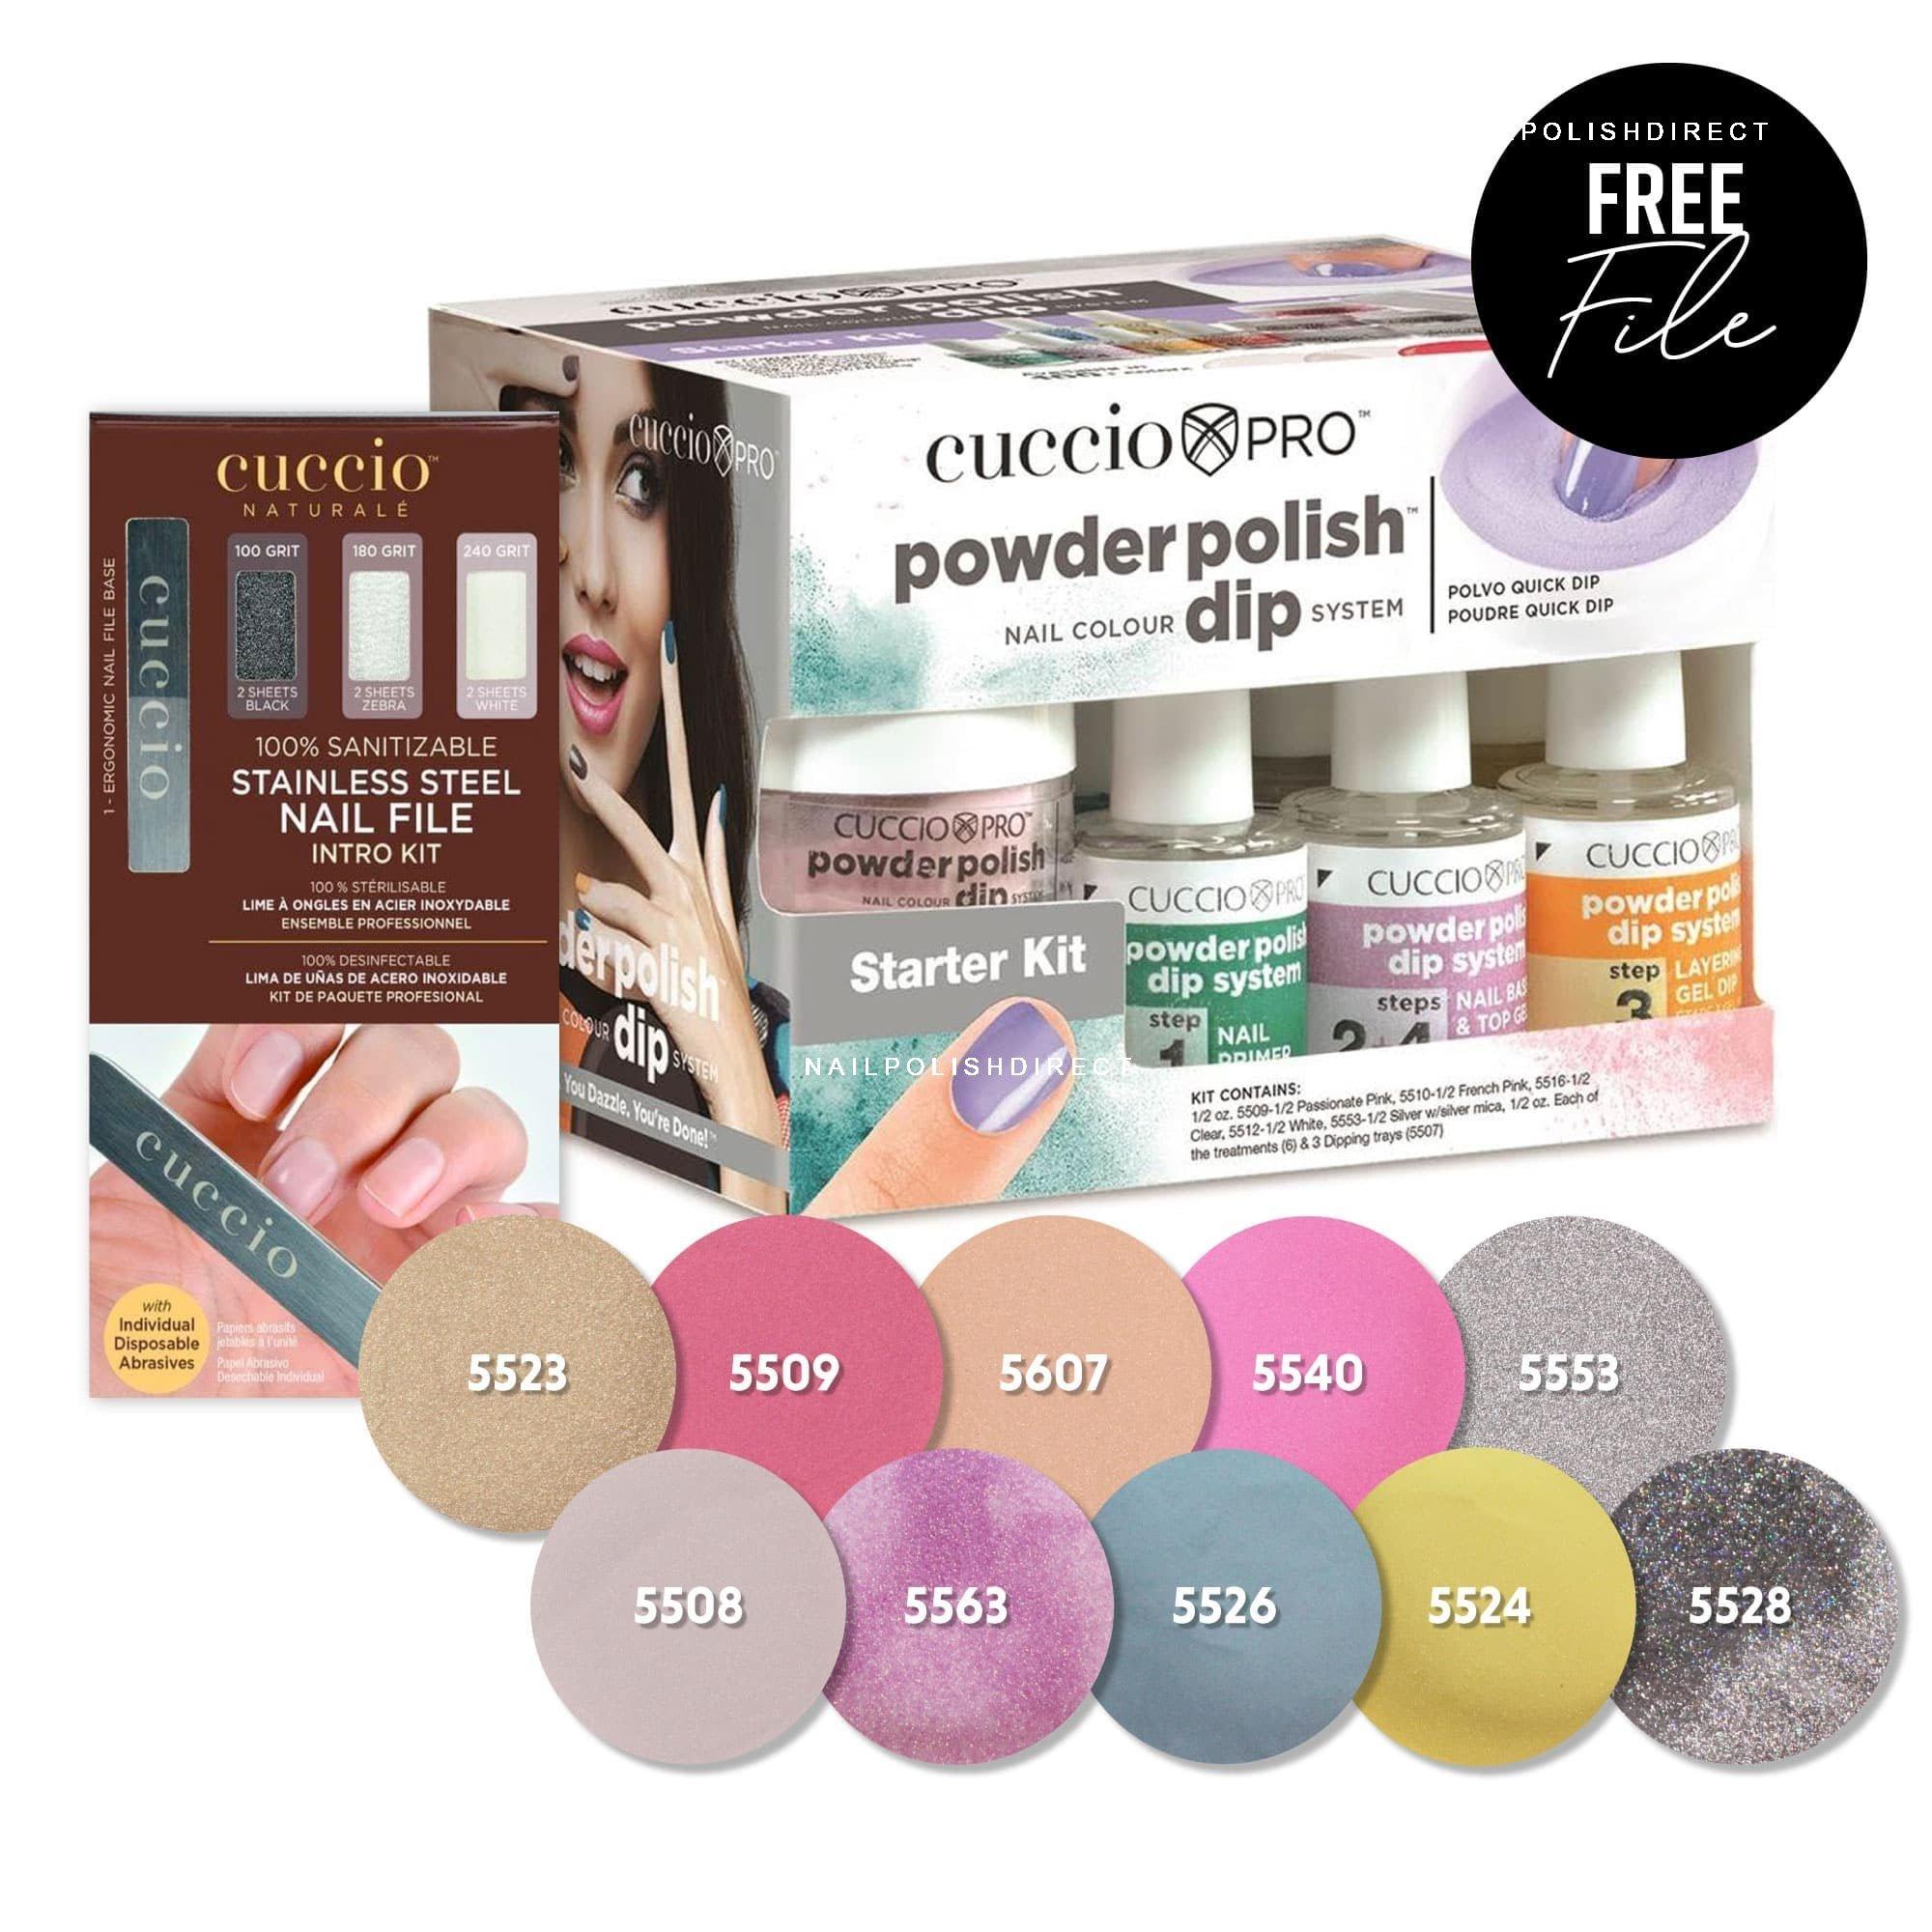 55cf002af5a Cuccio Cuccio Starter Kit For Powder Polish Dipping System   10 x Dip  Powders + Nail File Intro Kit